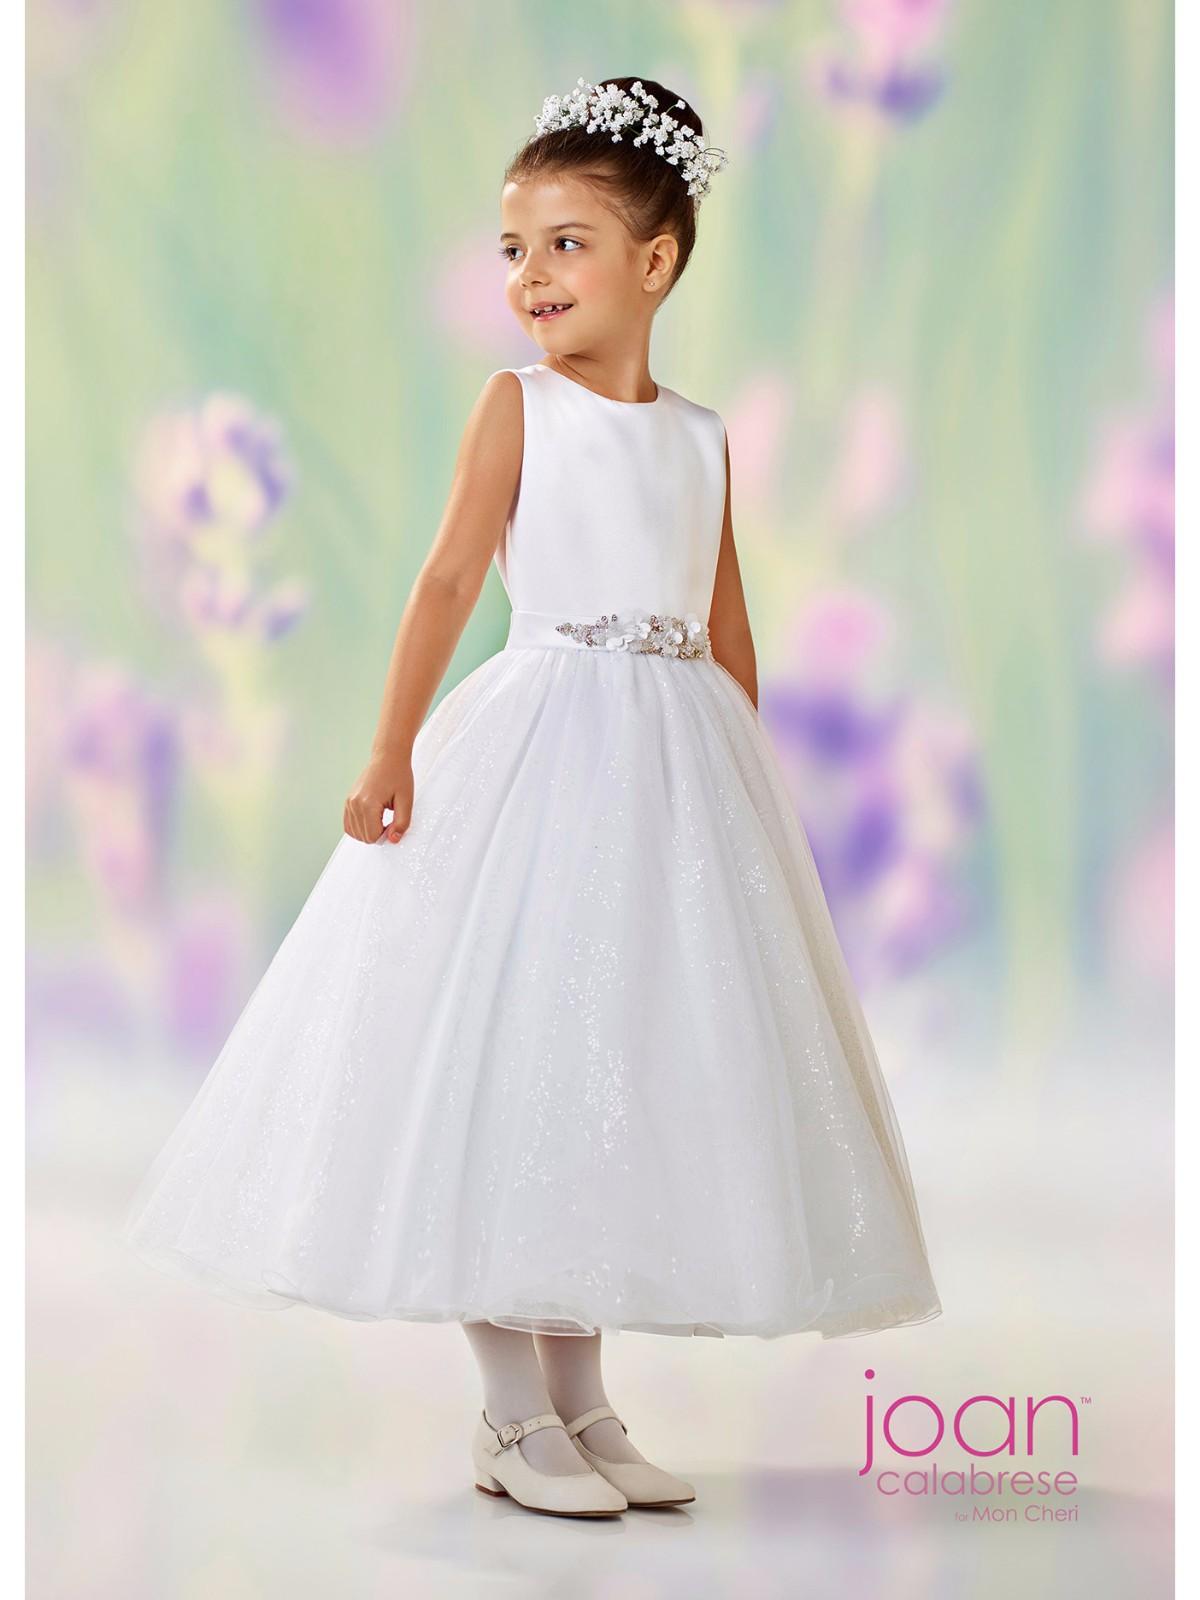 Joan Calabrese Communion Dresses Image